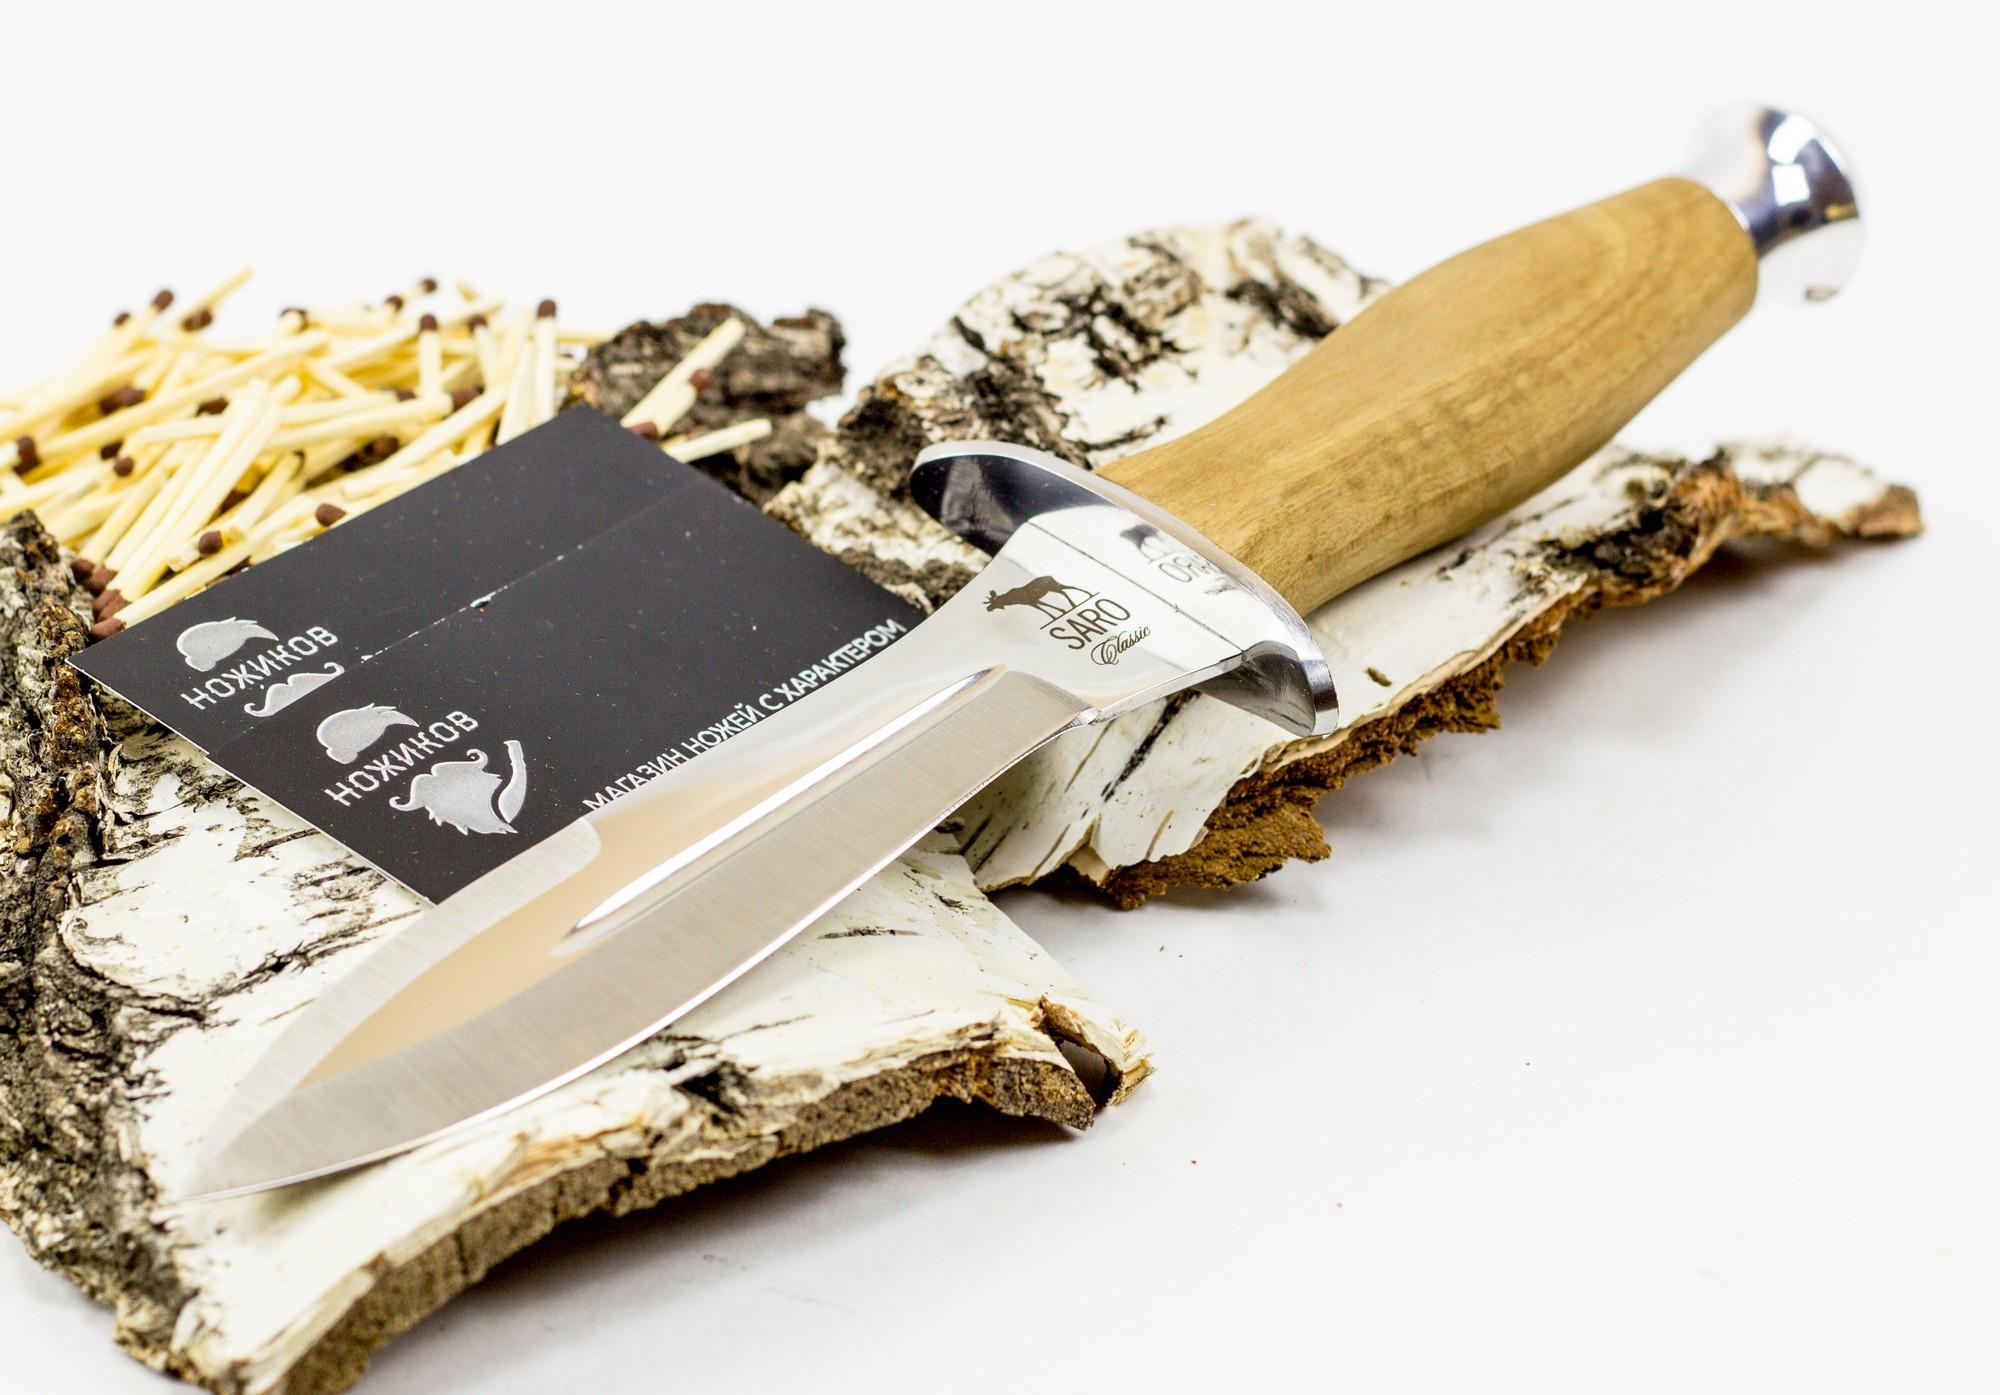 Фото 6 - Нож Кречет, дерево от САРО